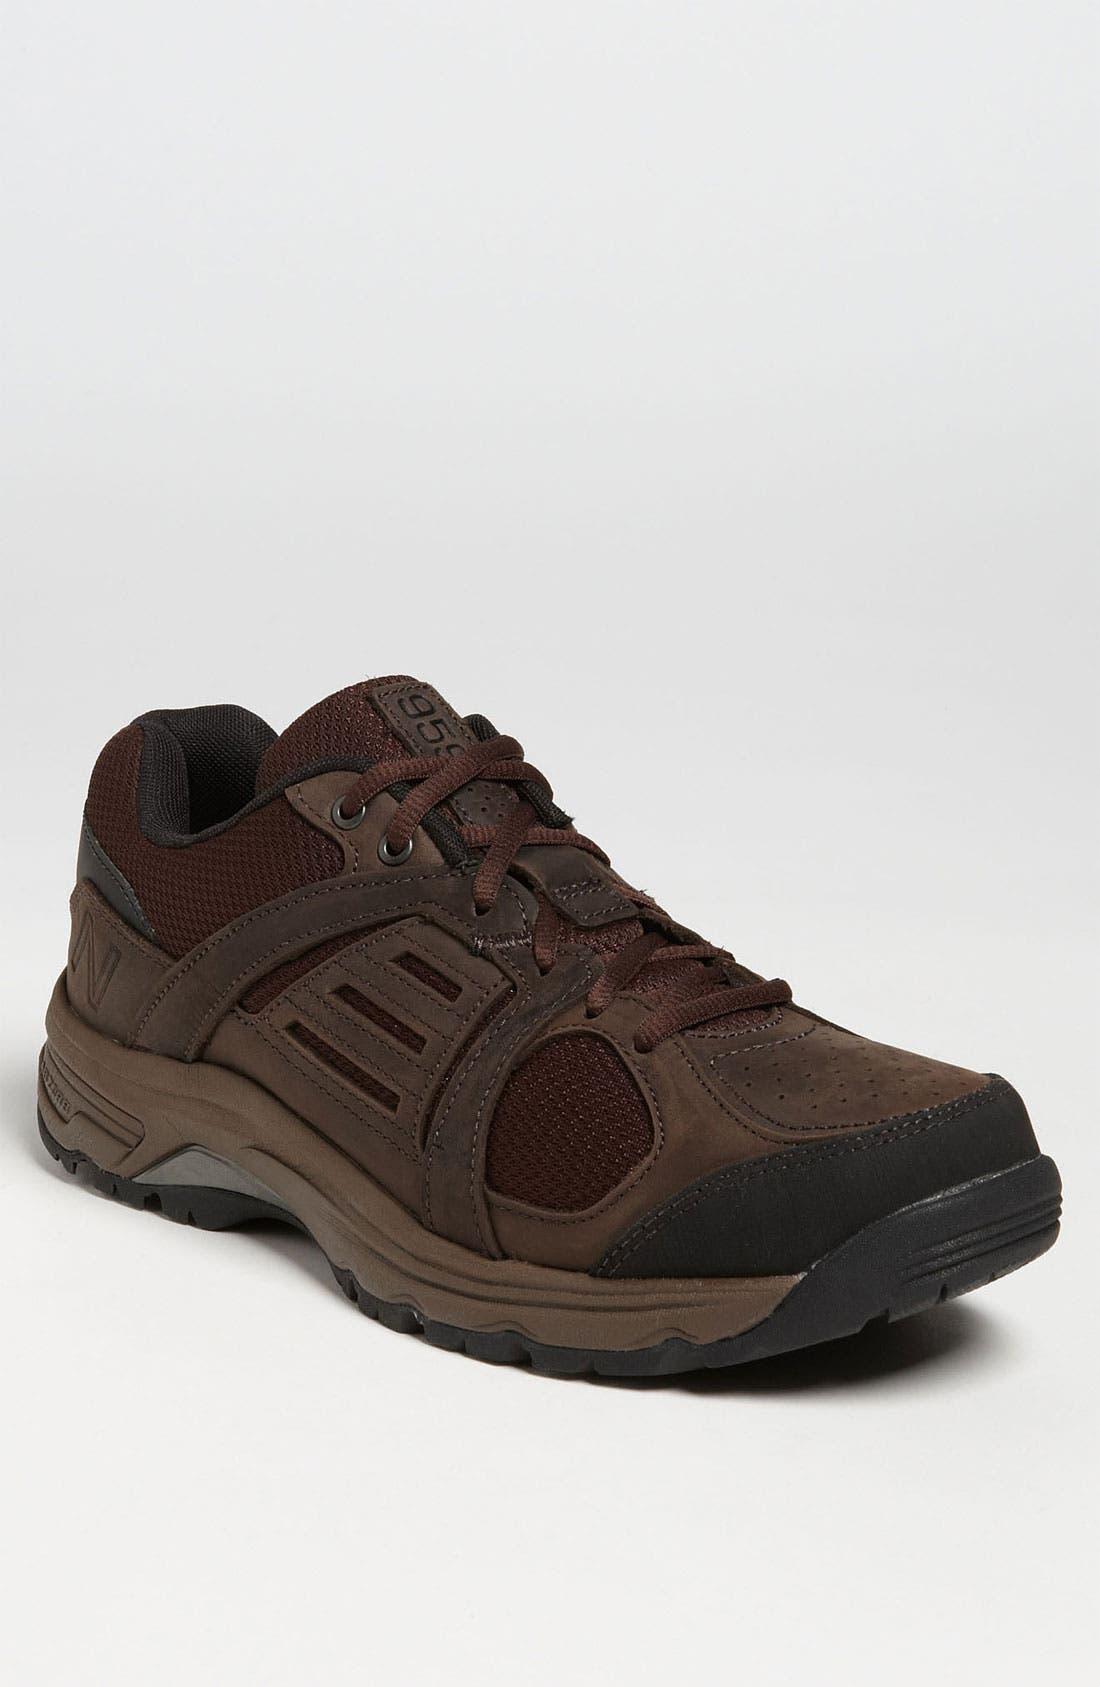 Alternate Image 1 Selected - New Balance '959' Walking Shoe (Men) (Online Only)